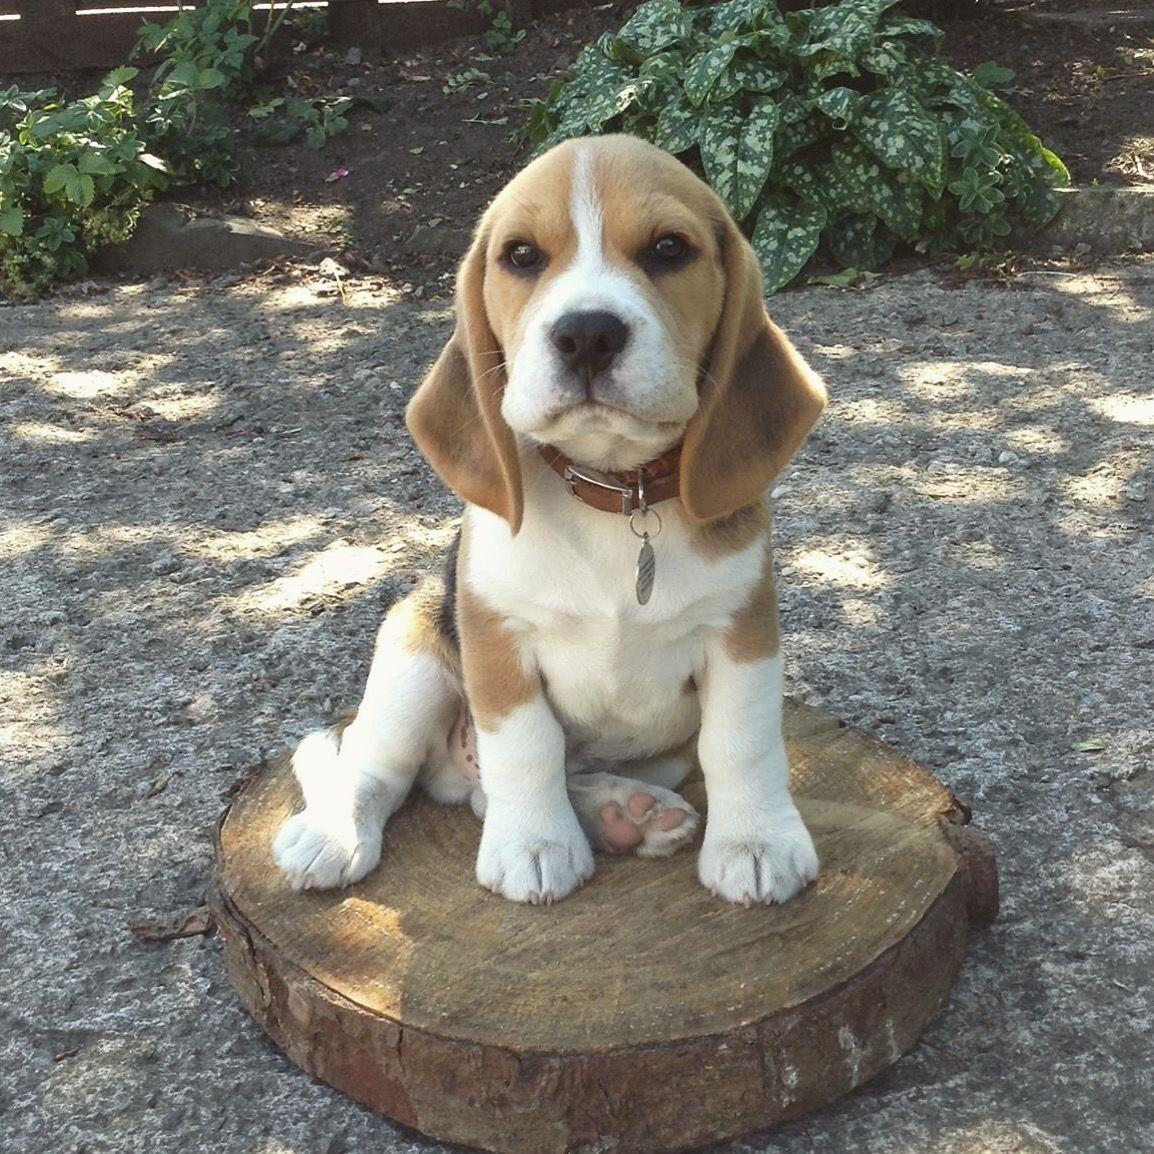 DOGTV Stimulation Dog Playing in Corn Field Beagle